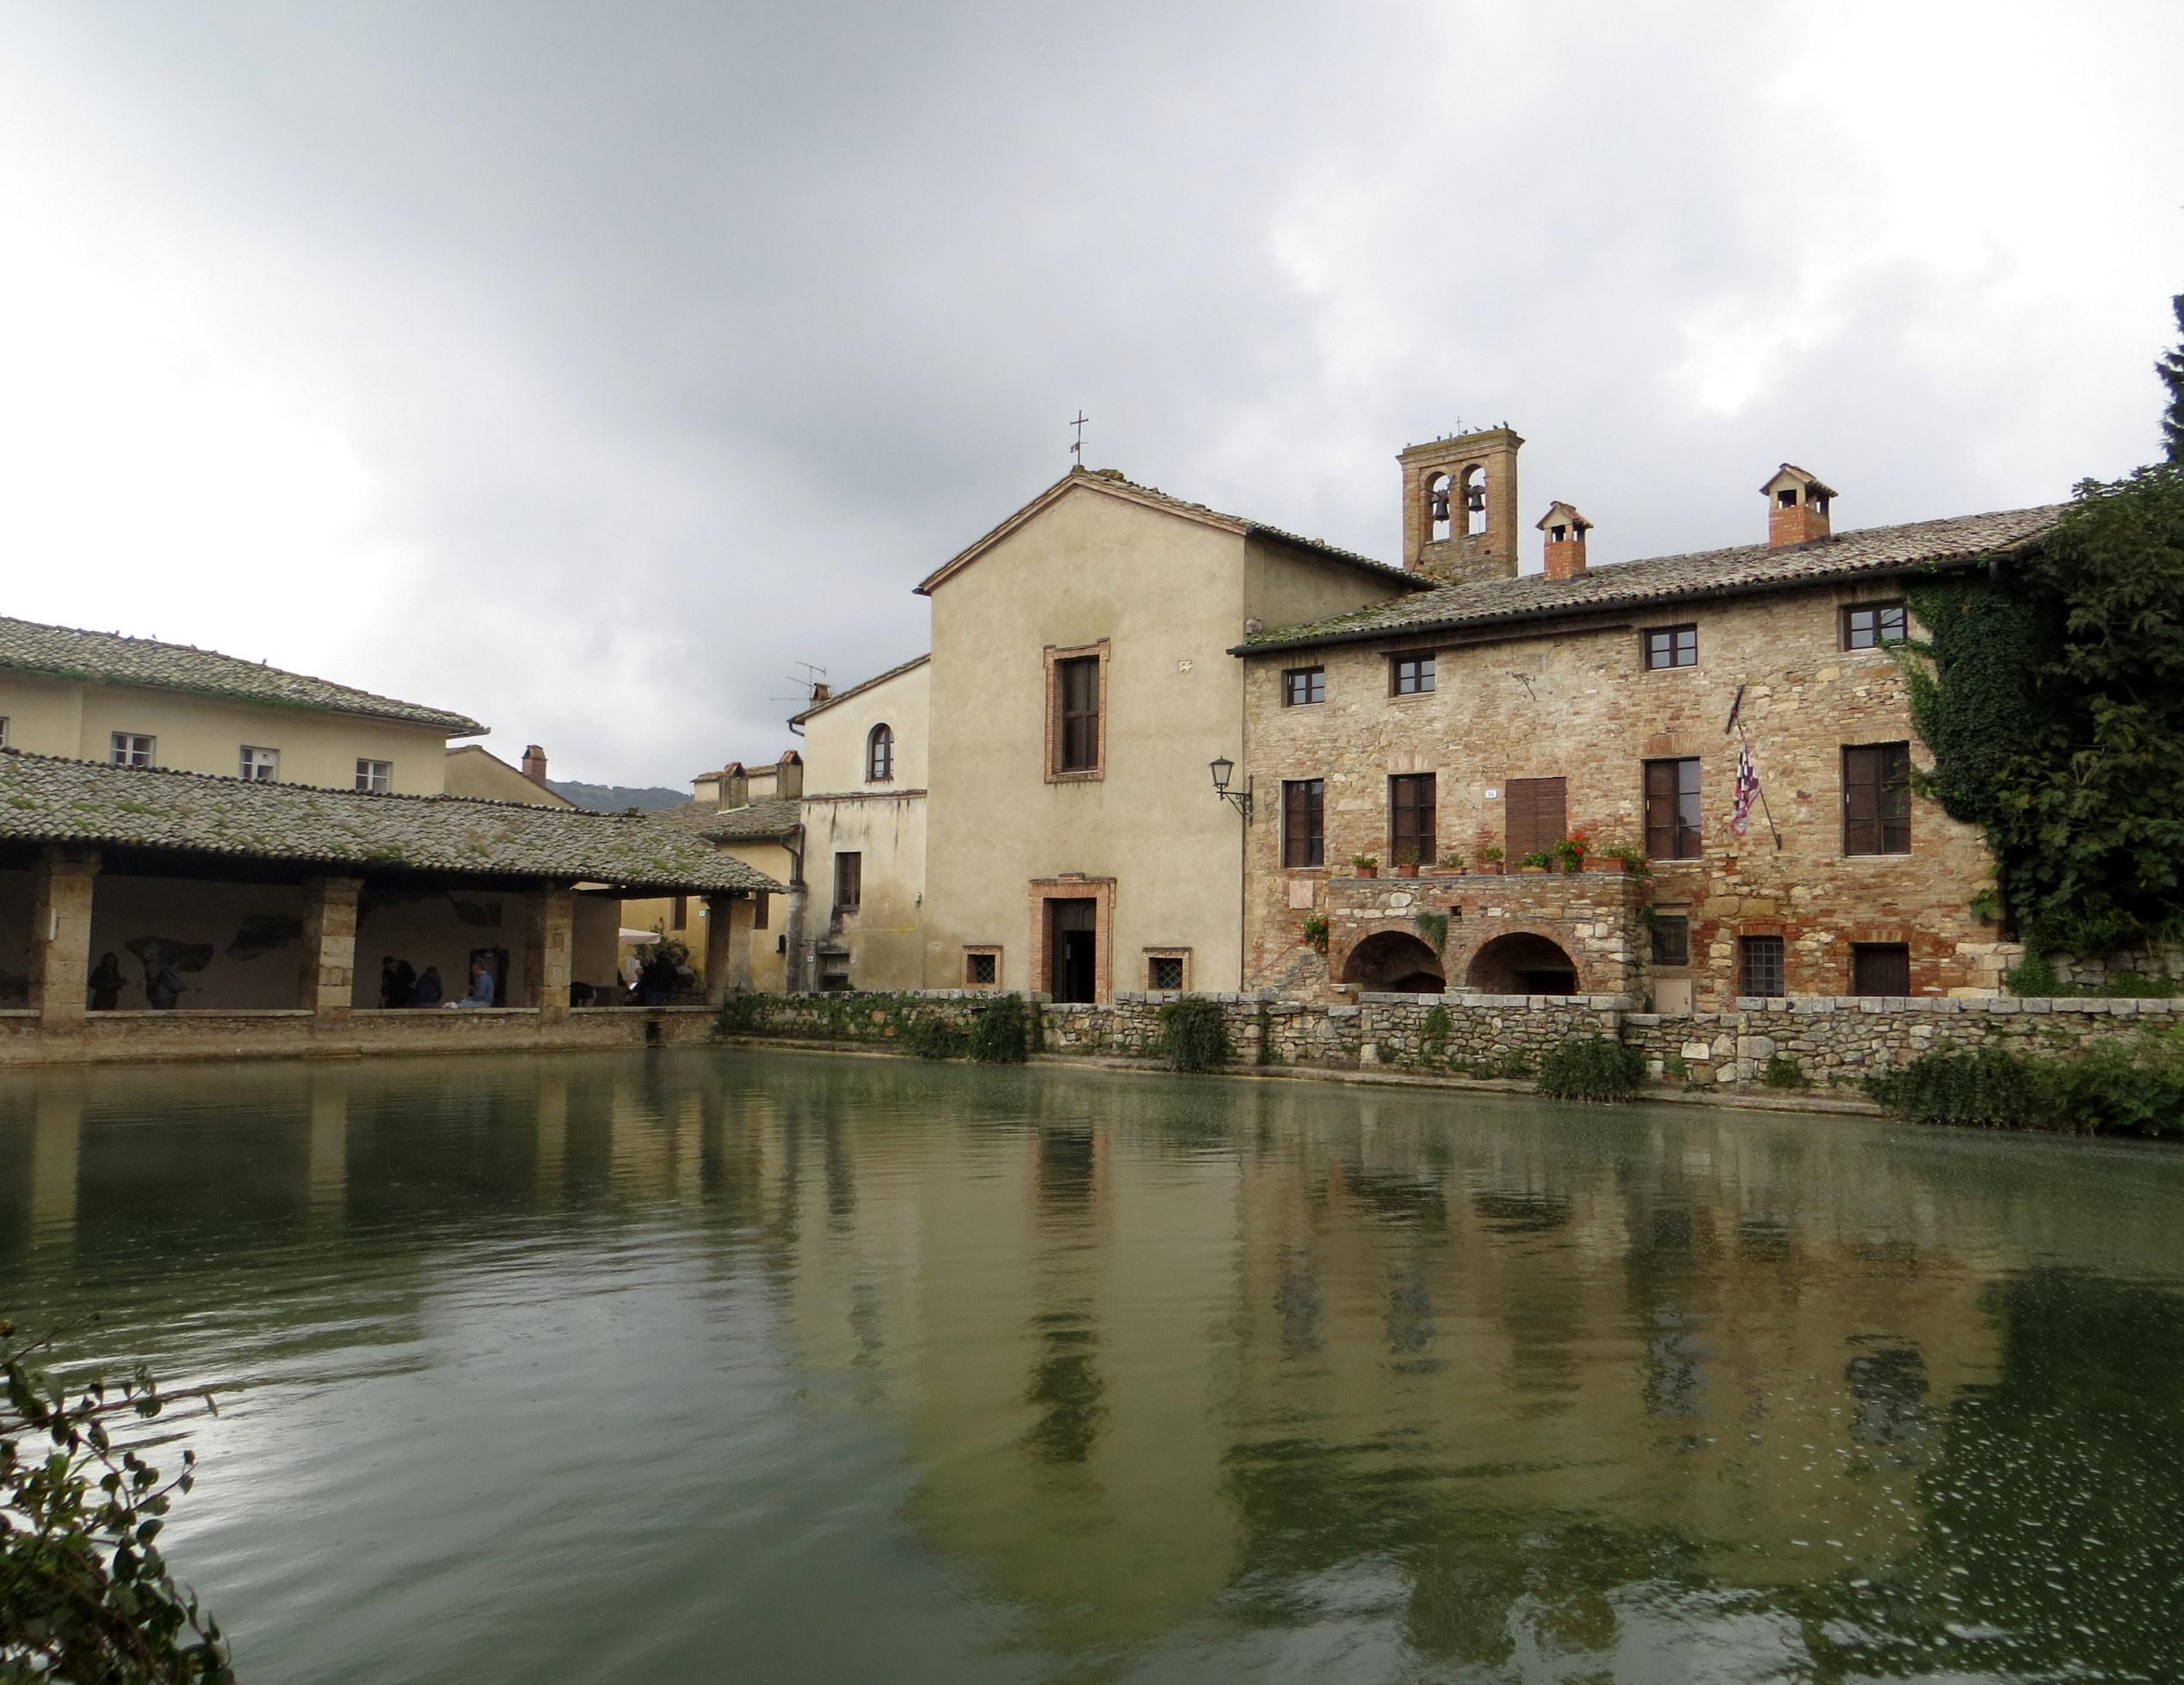 File:Bagni Vignone (Val d\'Orcia).JPG - Wikimedia Commons